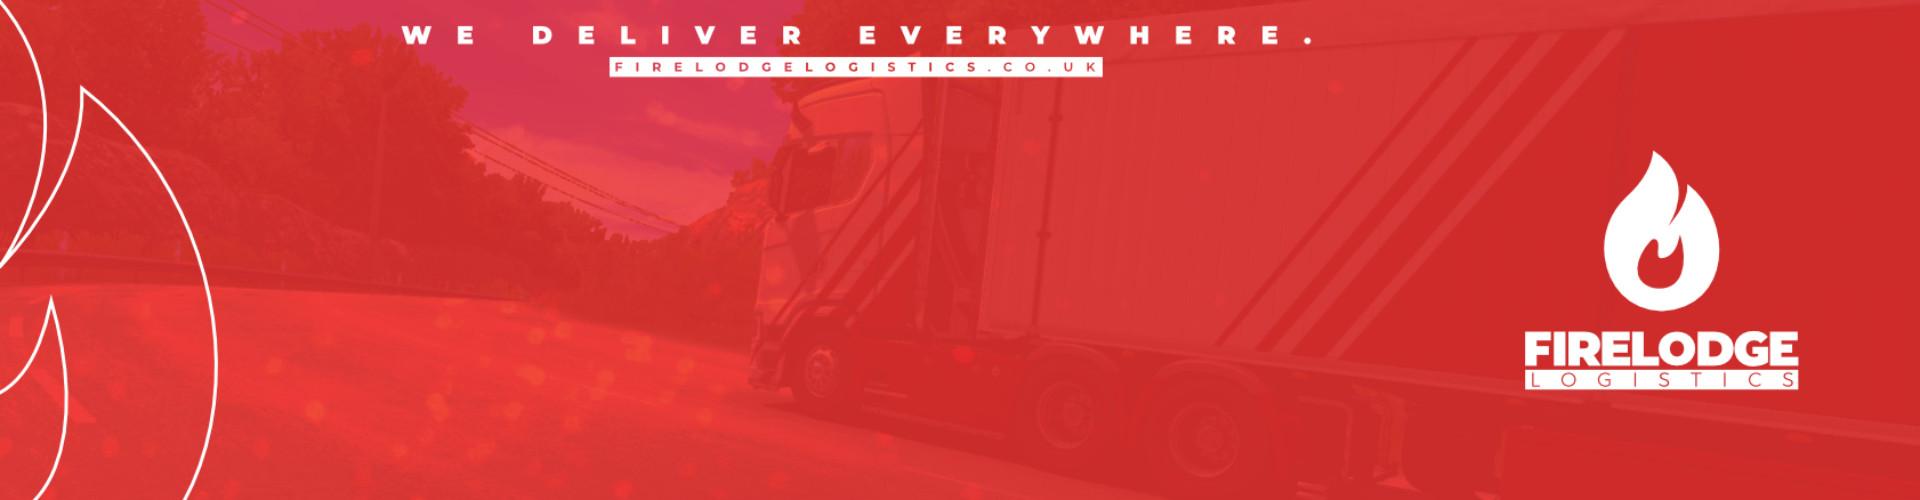 Firelodge Logistics Monthly #2